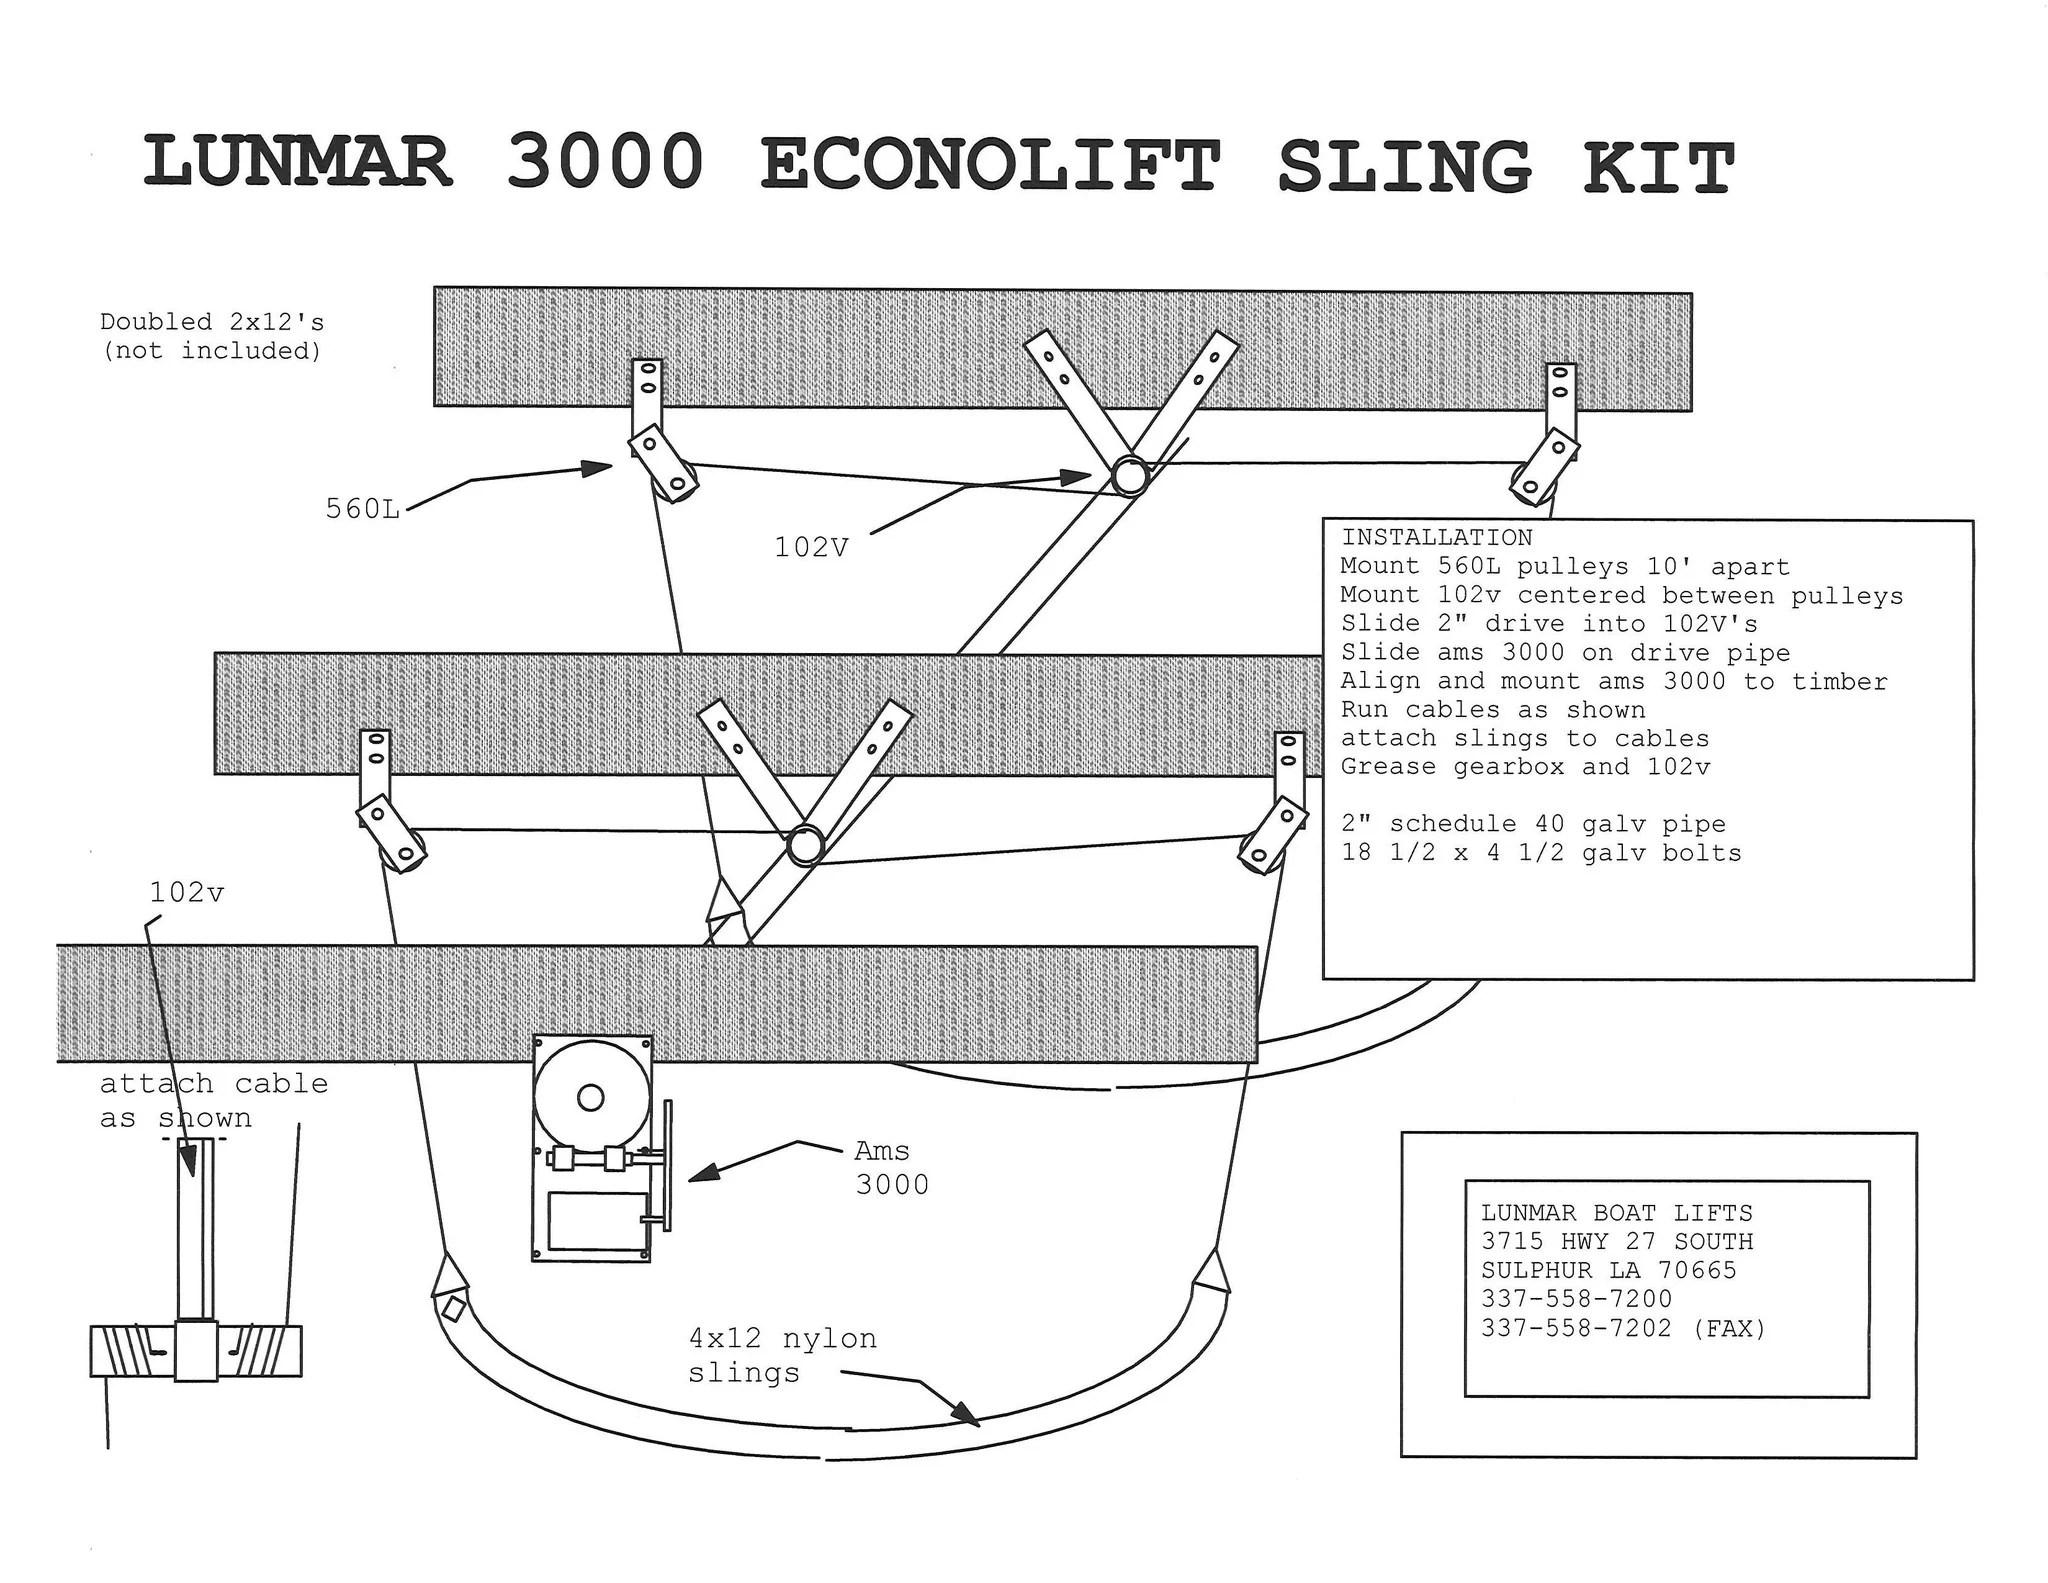 Reversing Drum Switch Wiring Diagram \u2013 davidbolton.co